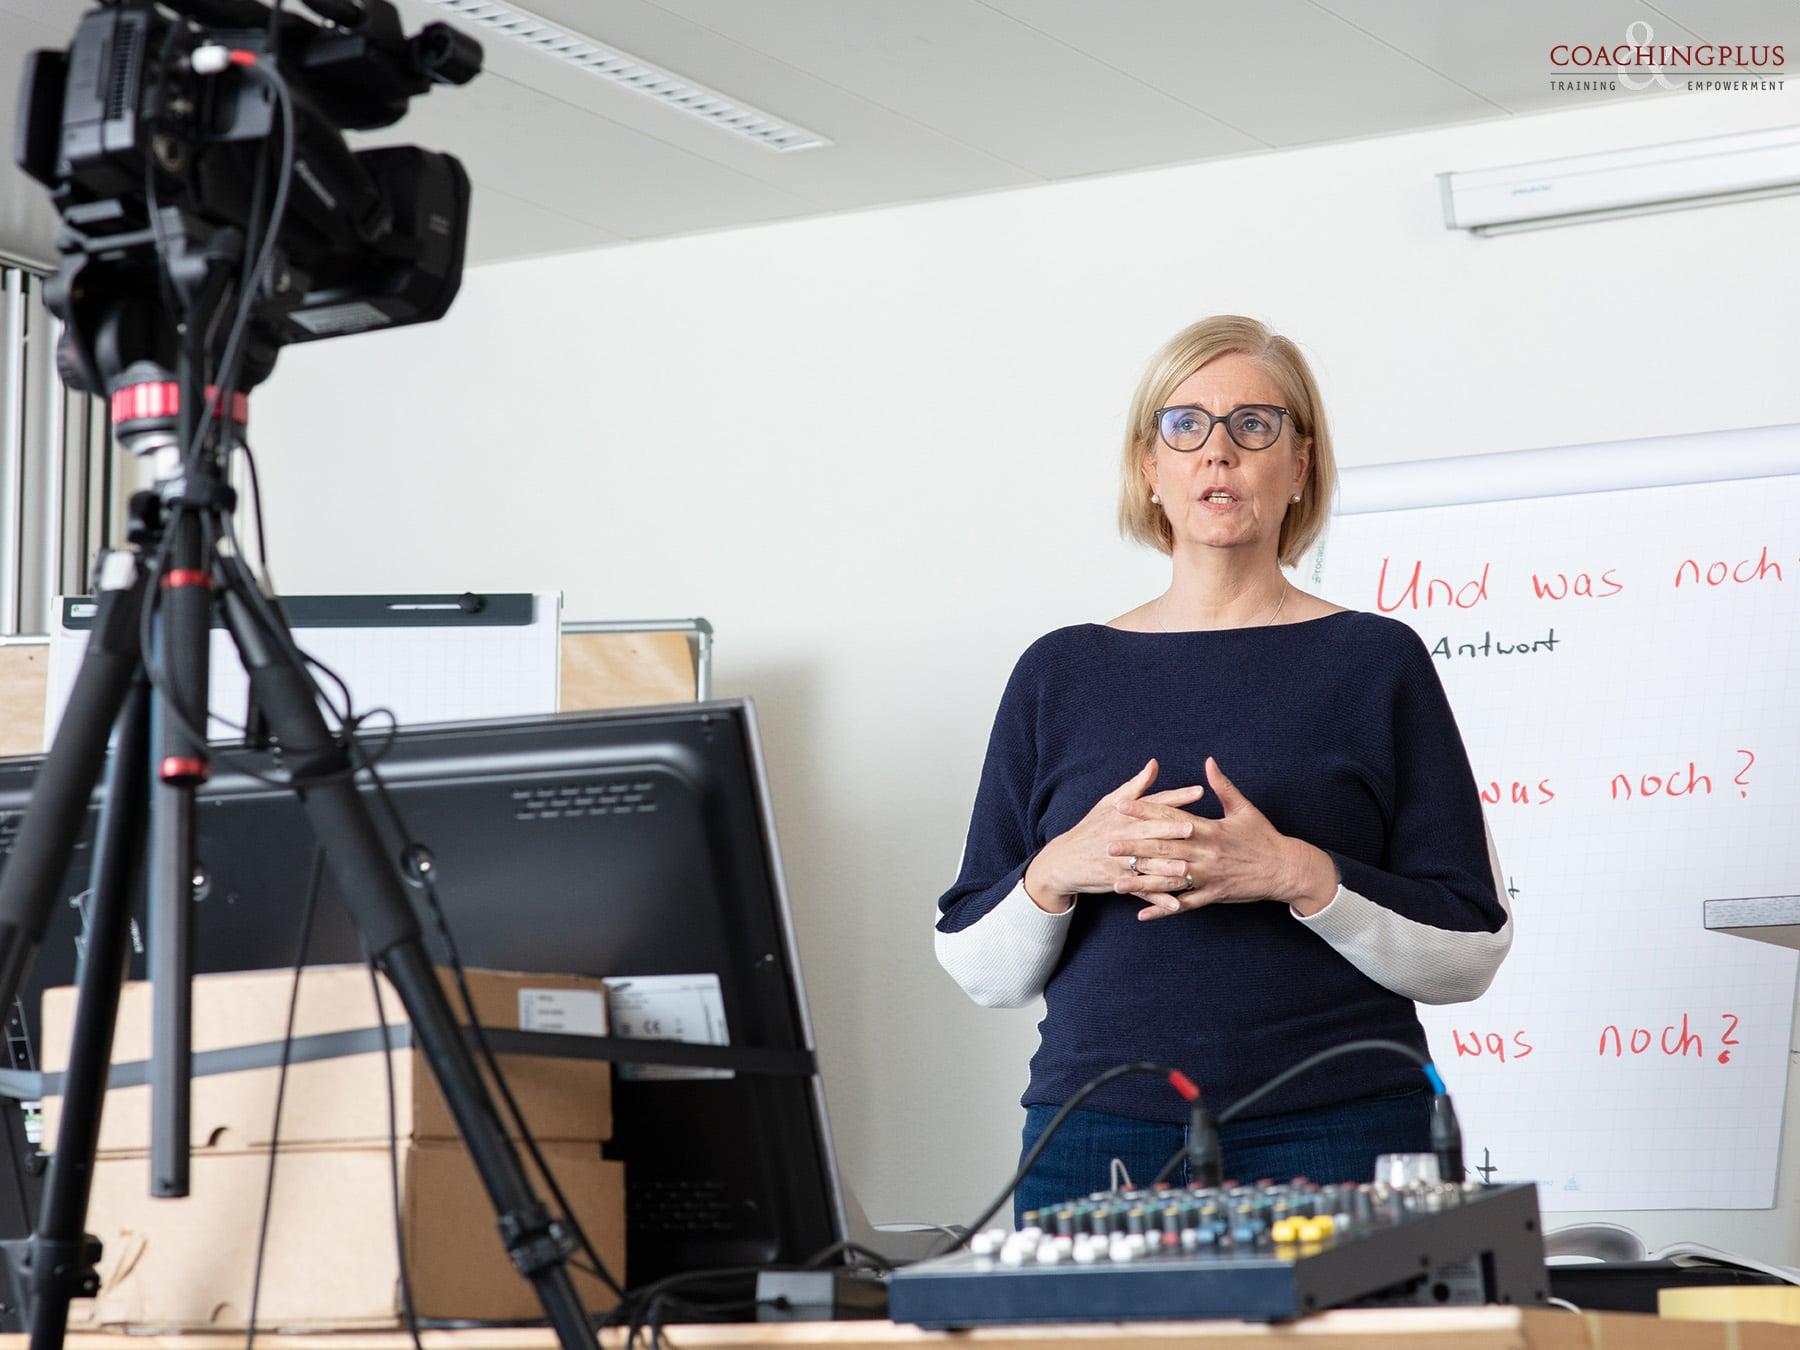 Virtuelles Schulzimmer in Kloten - Coachingplus